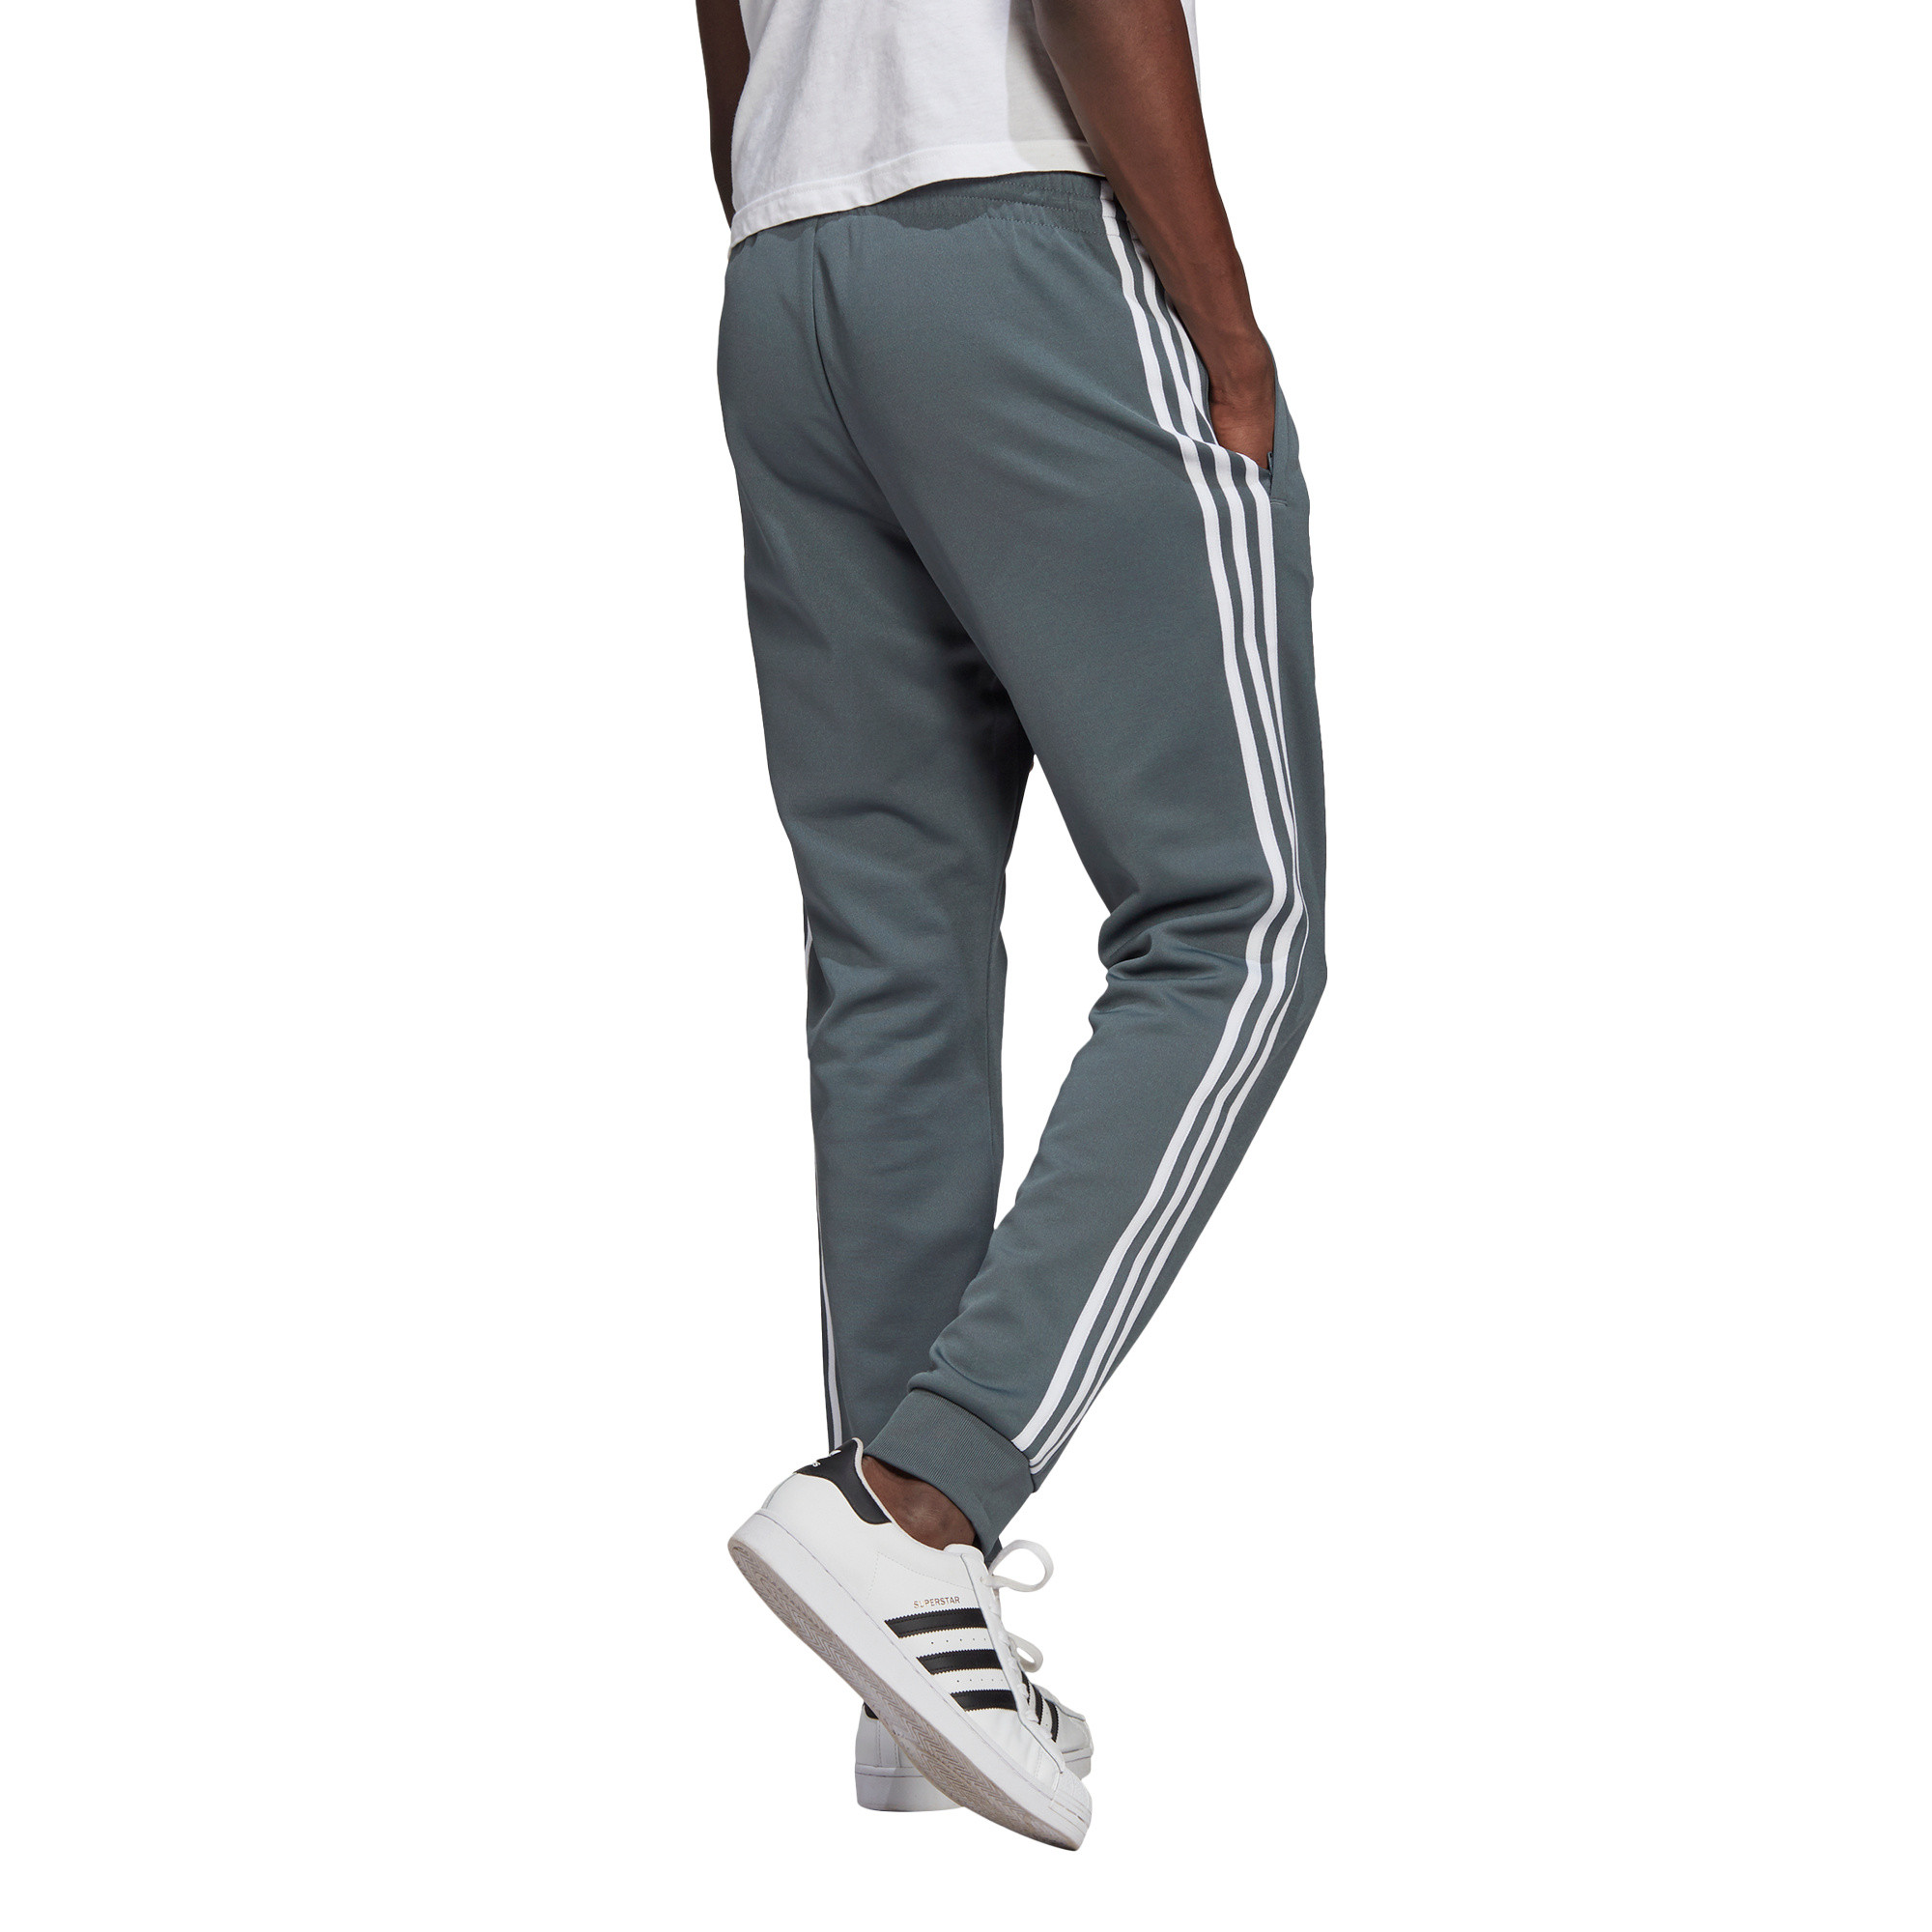 Pantaloni tuta Adicolor Classics Primeblue SST, Blu, large image number 1